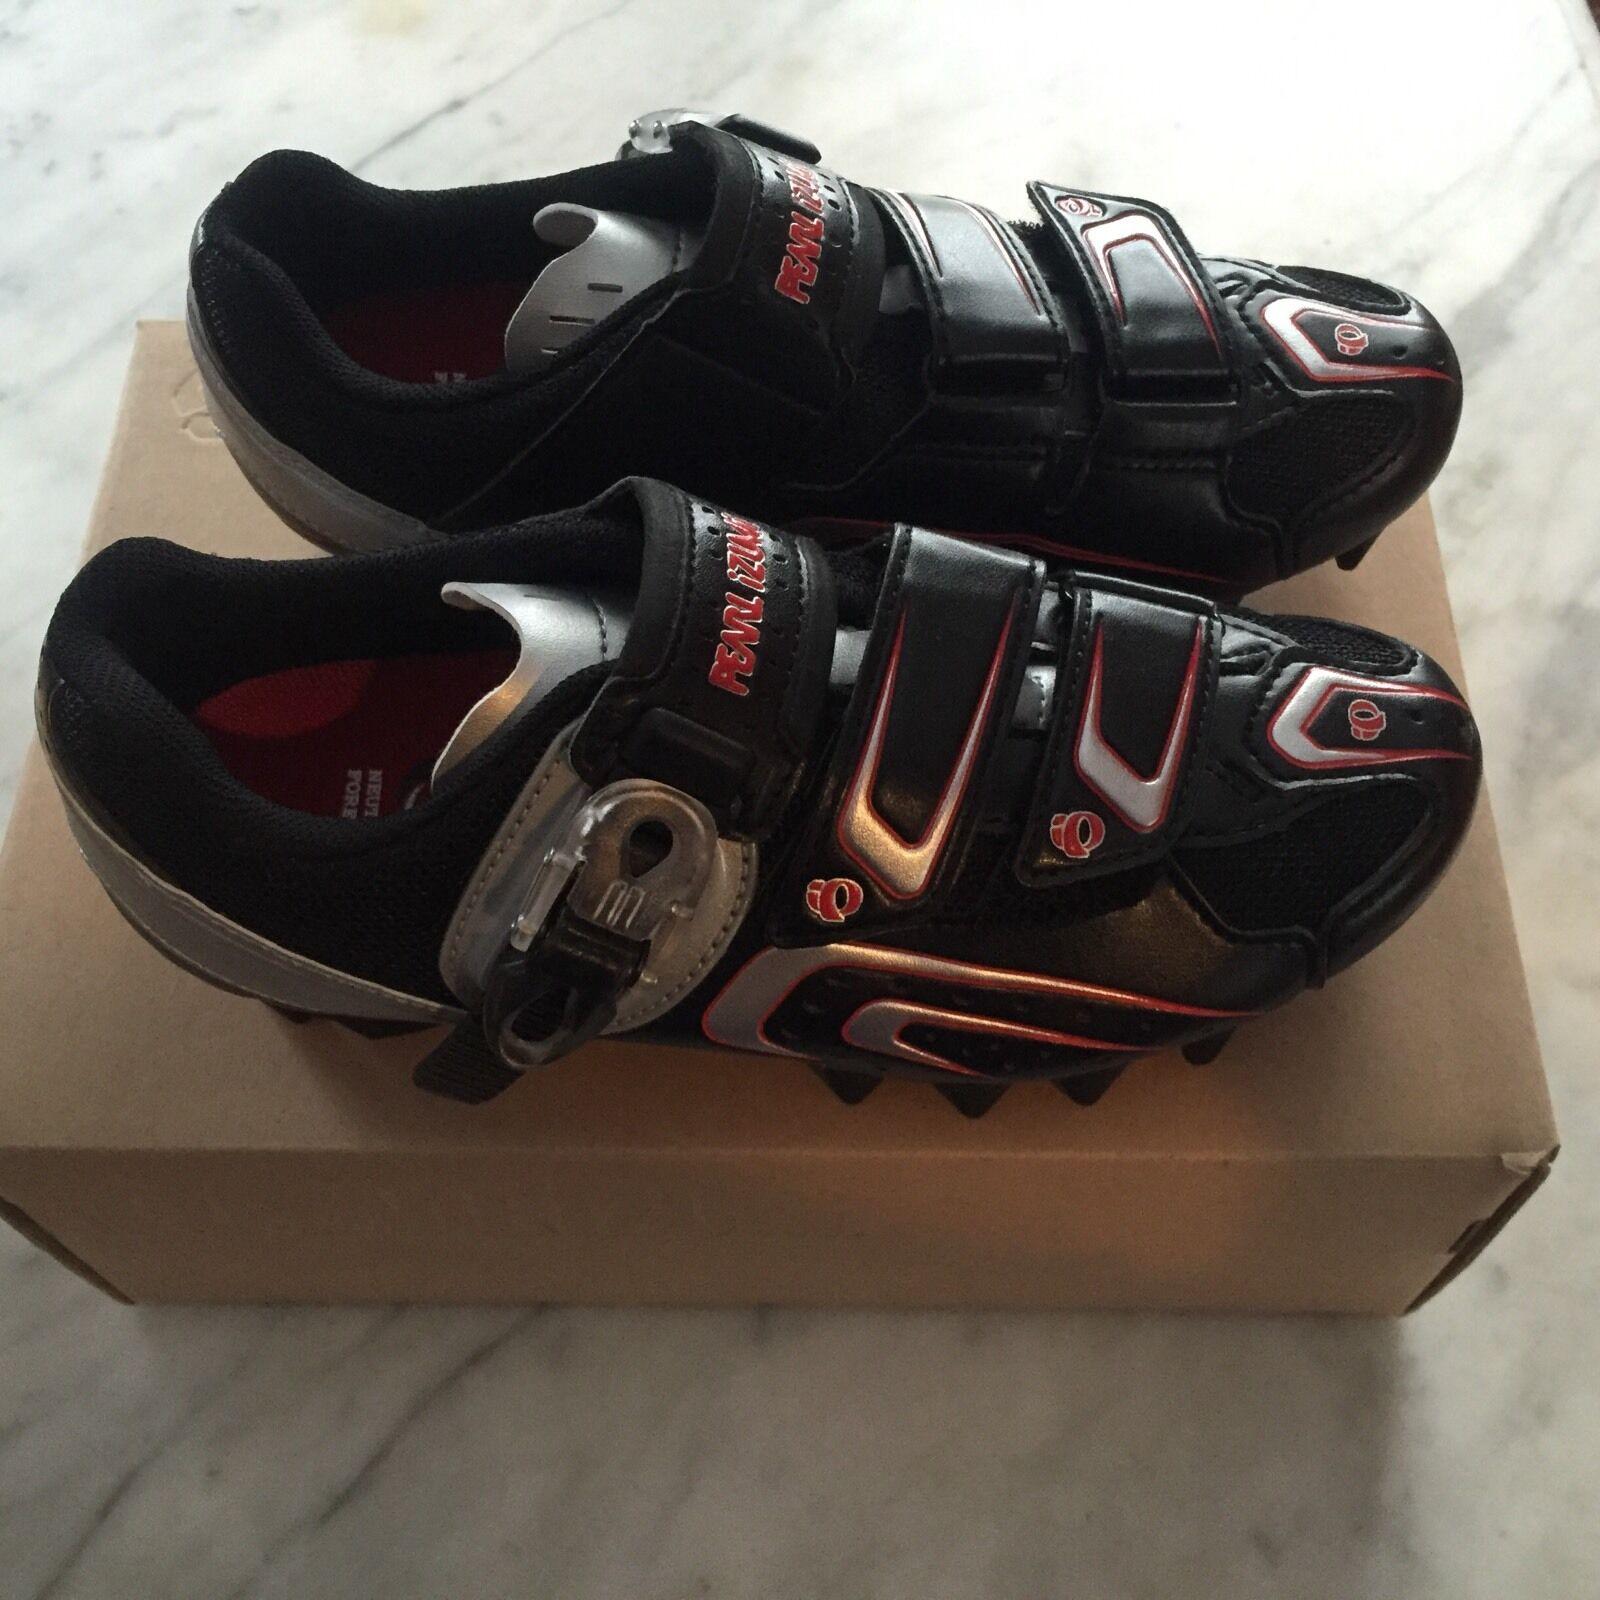 NOS Women's Pearl Izumi Race MTB Mountain Spin shoes 2-Bolt SPD Size 37 EURO